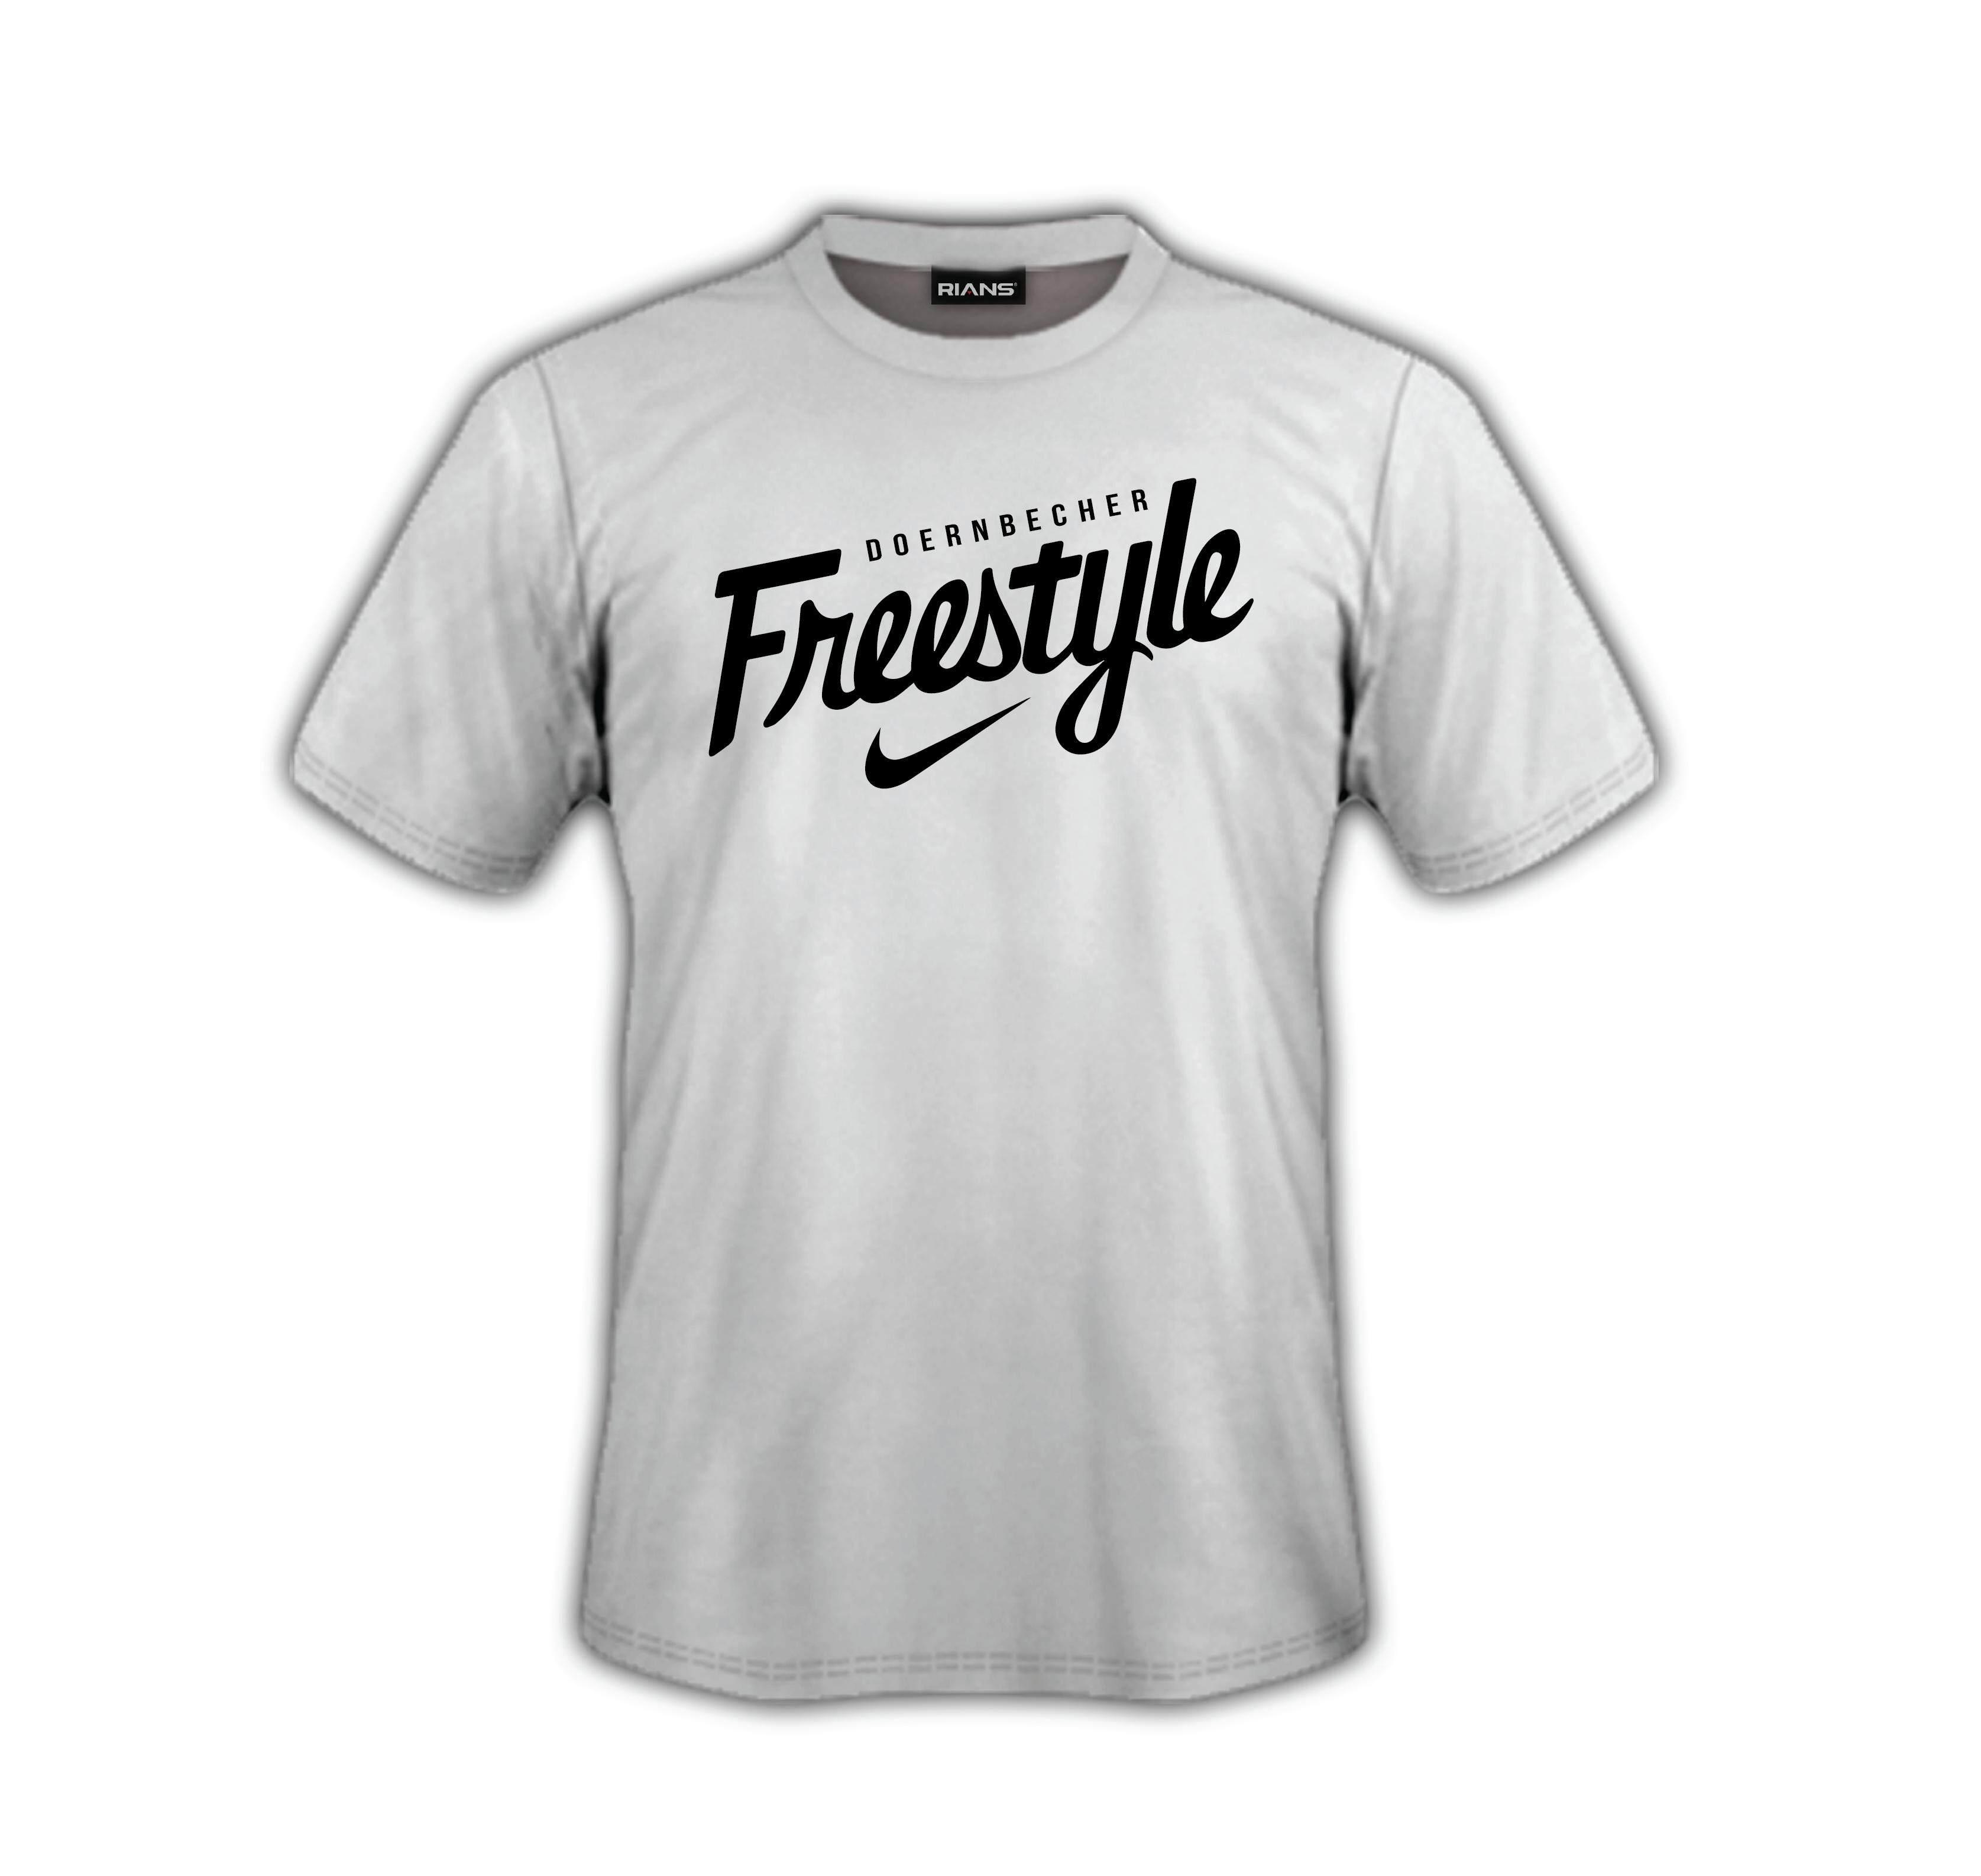 T-Shirt DOERNBECHER FREESTYLE nike 100% Cotton Baju Tshirt Black White Hitam Putih Bossku